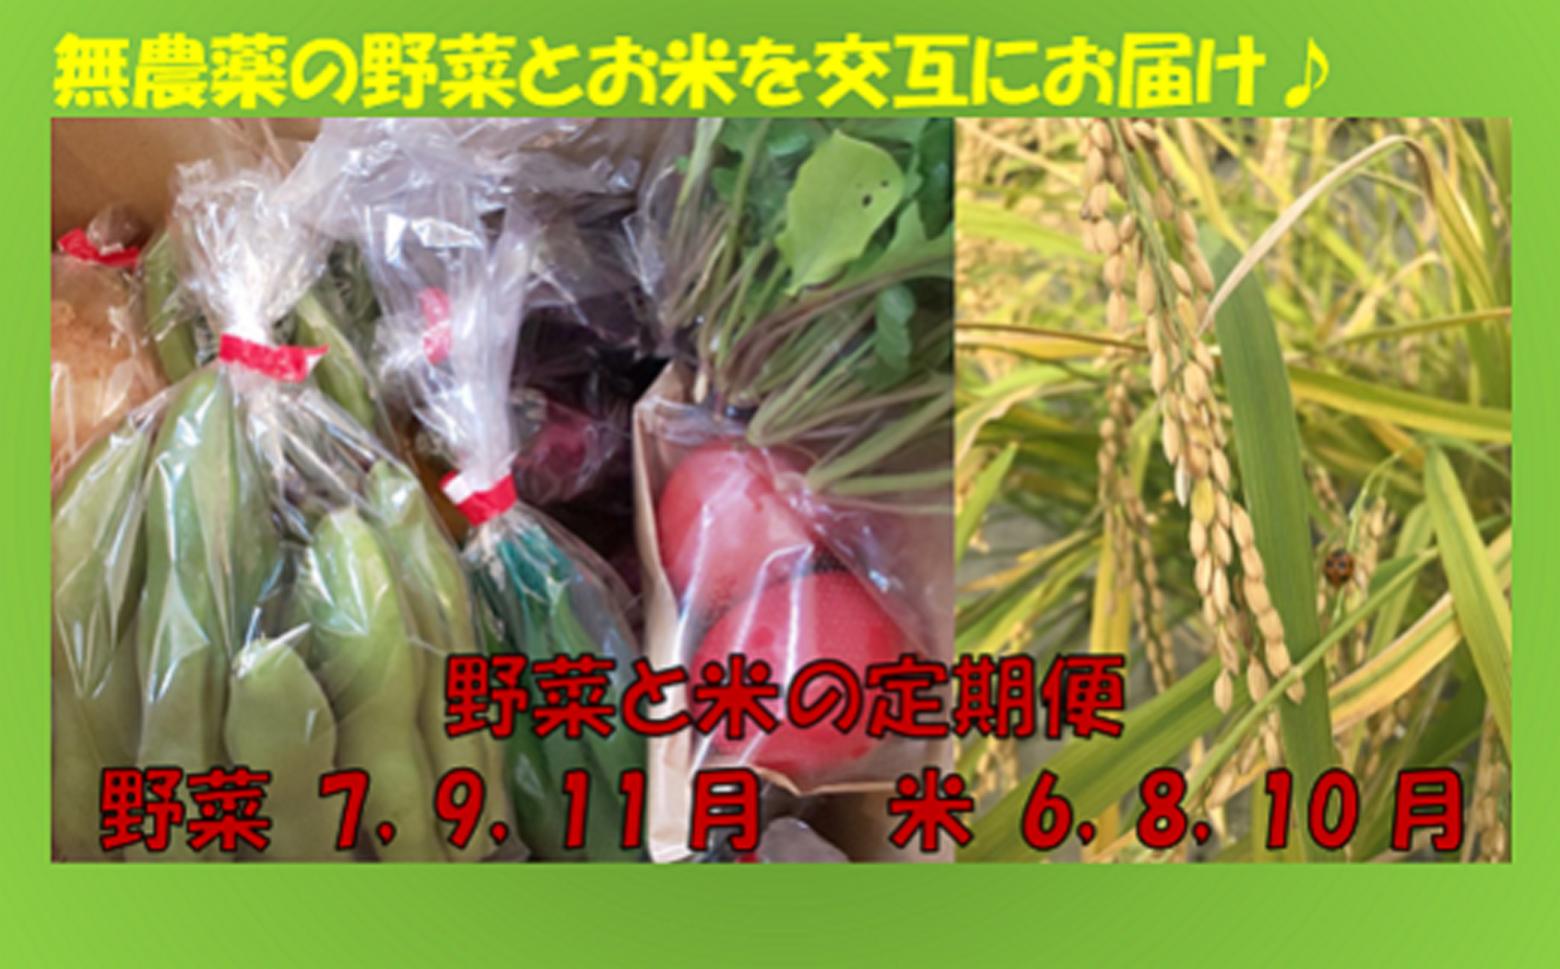 M-GA2.【全部で6回届く】野菜とお米(ひのひかり)の定期便